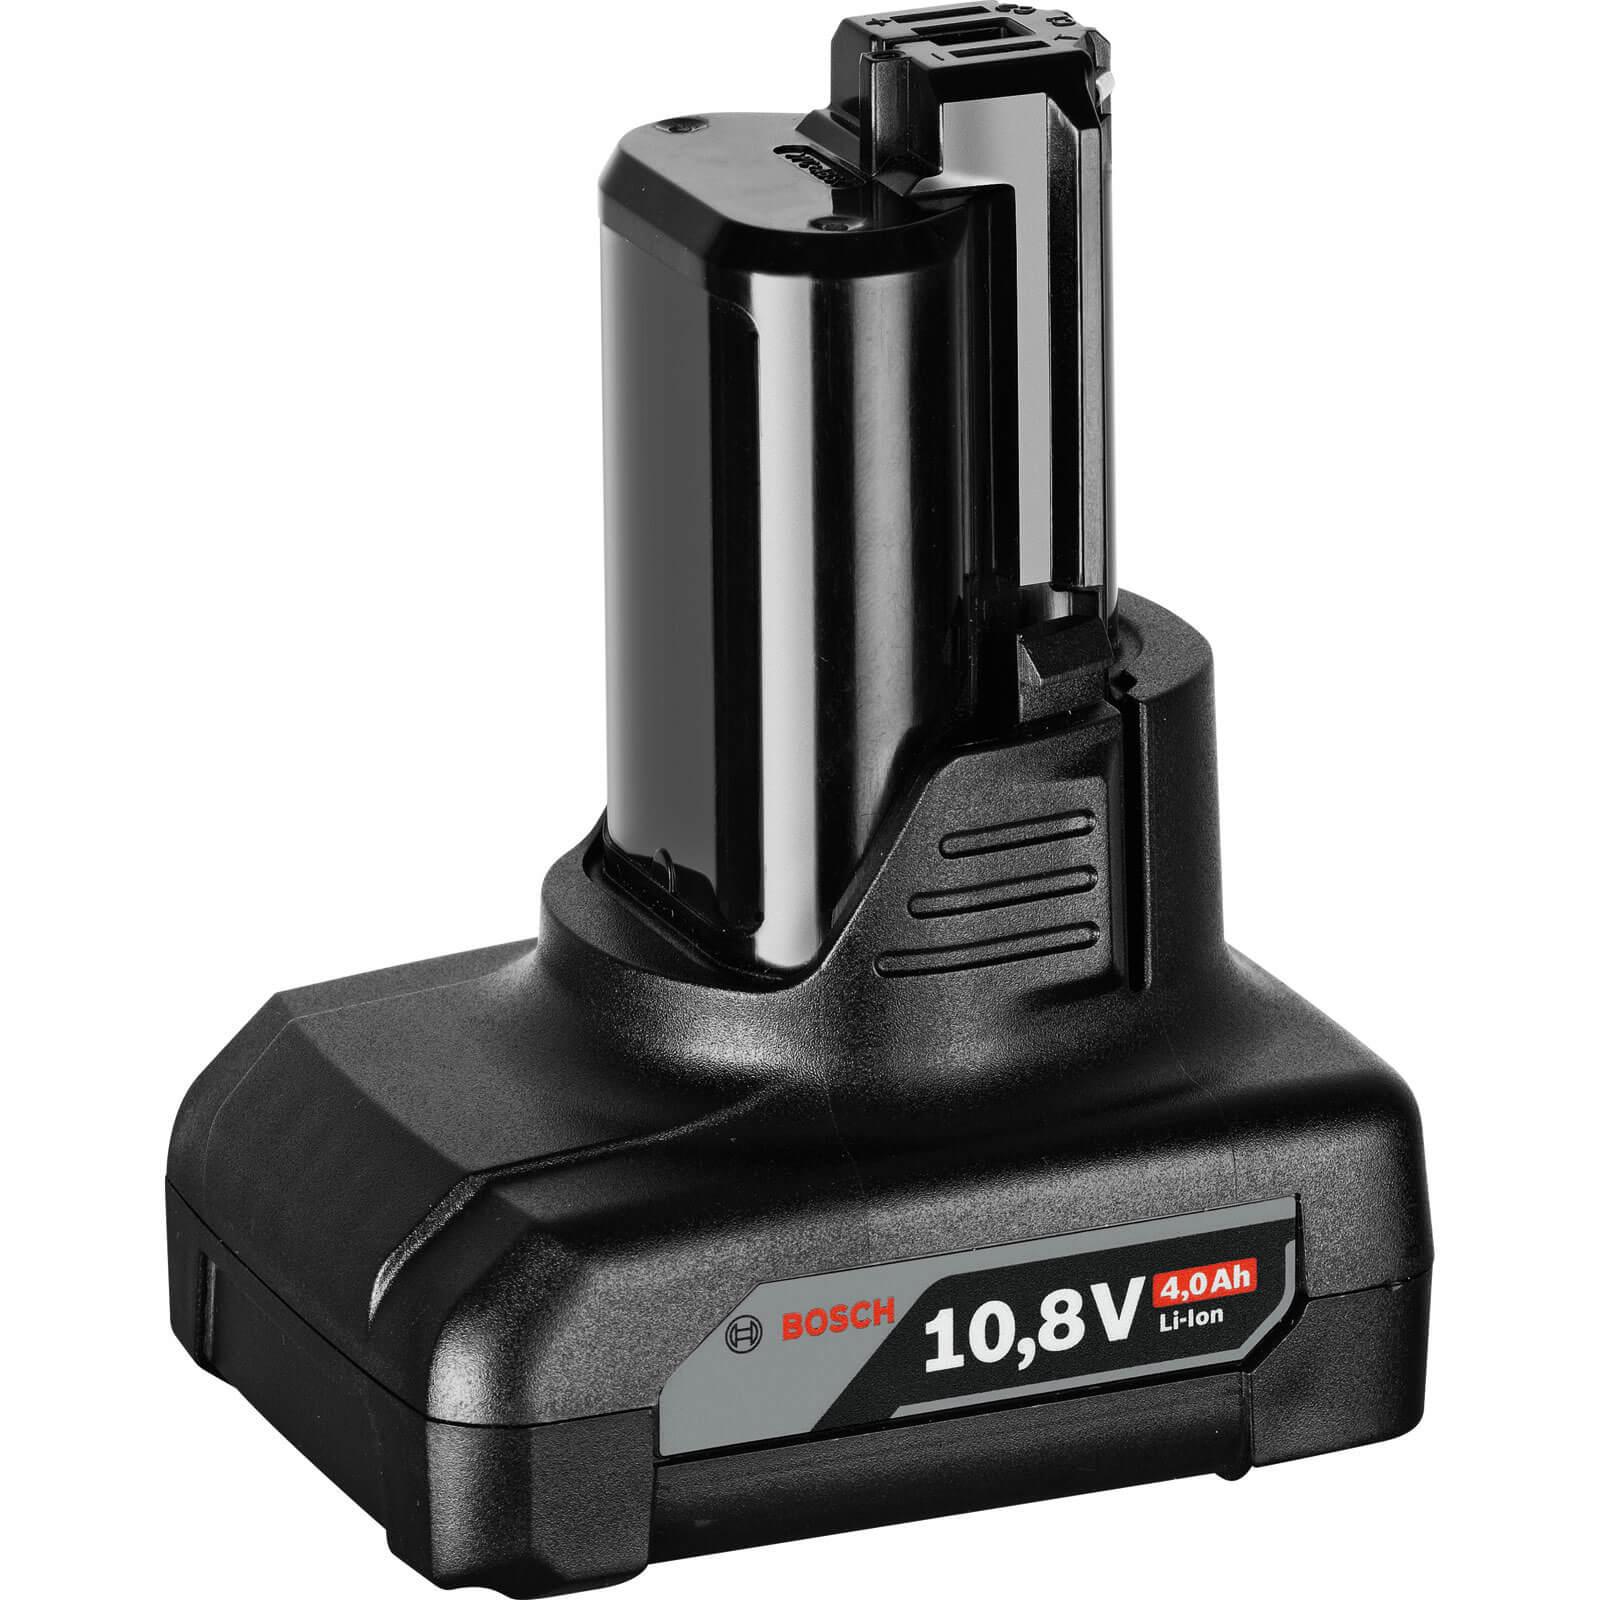 Image of Bosch GBA 12 V Cordless Li-ion Battery 4ah 4ah